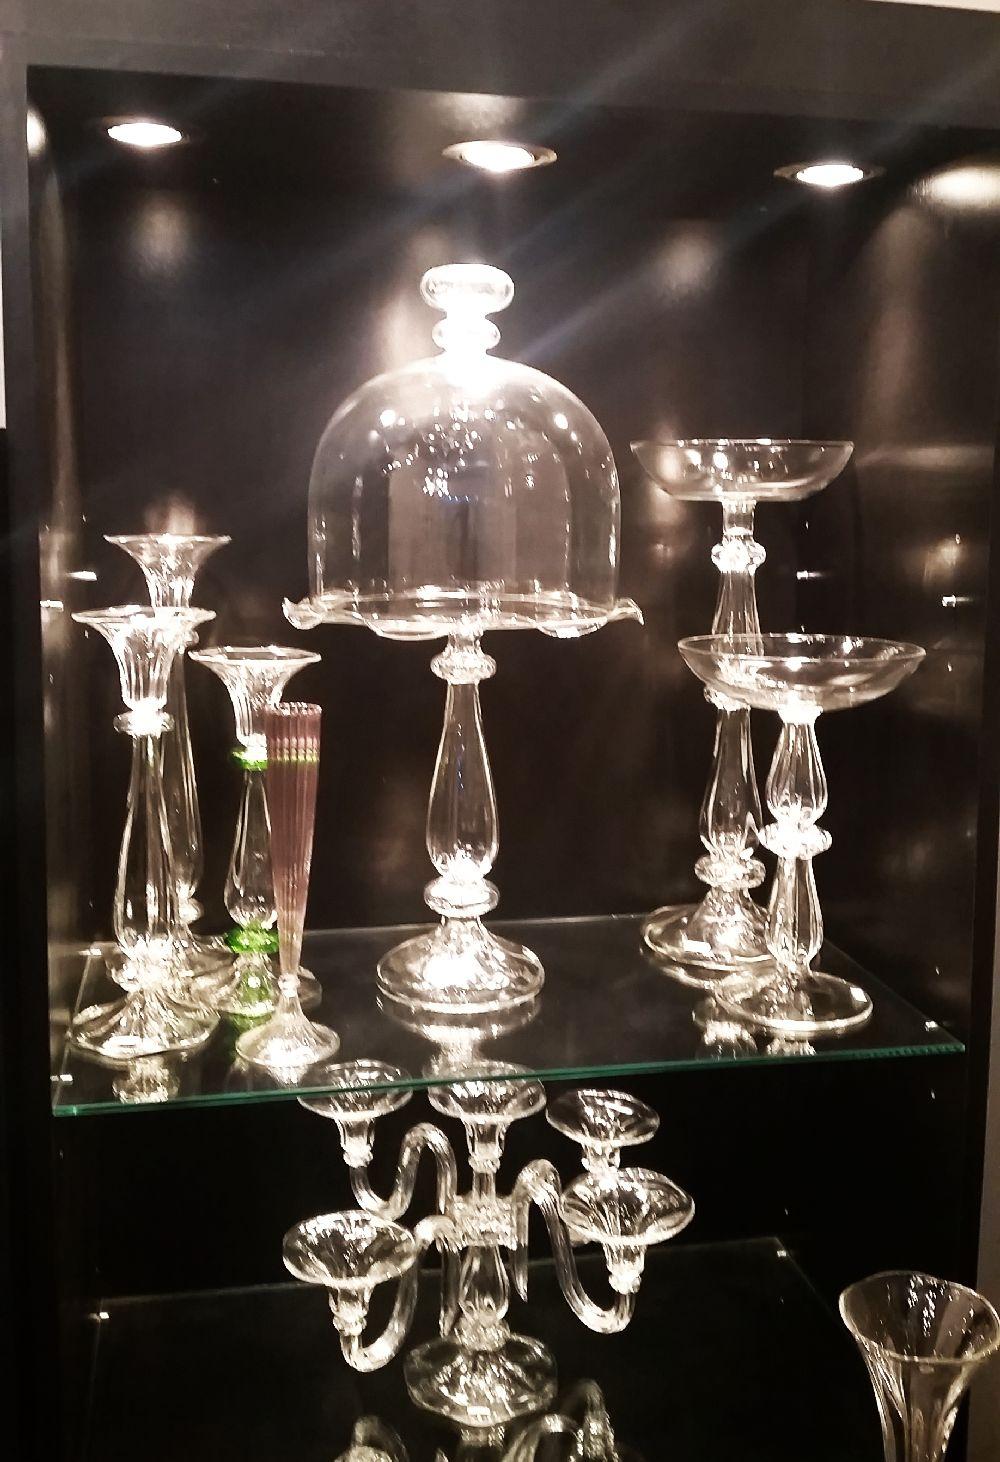 adelaparvu.com despre atelierul de sticlarie Gabriela Seres (9)